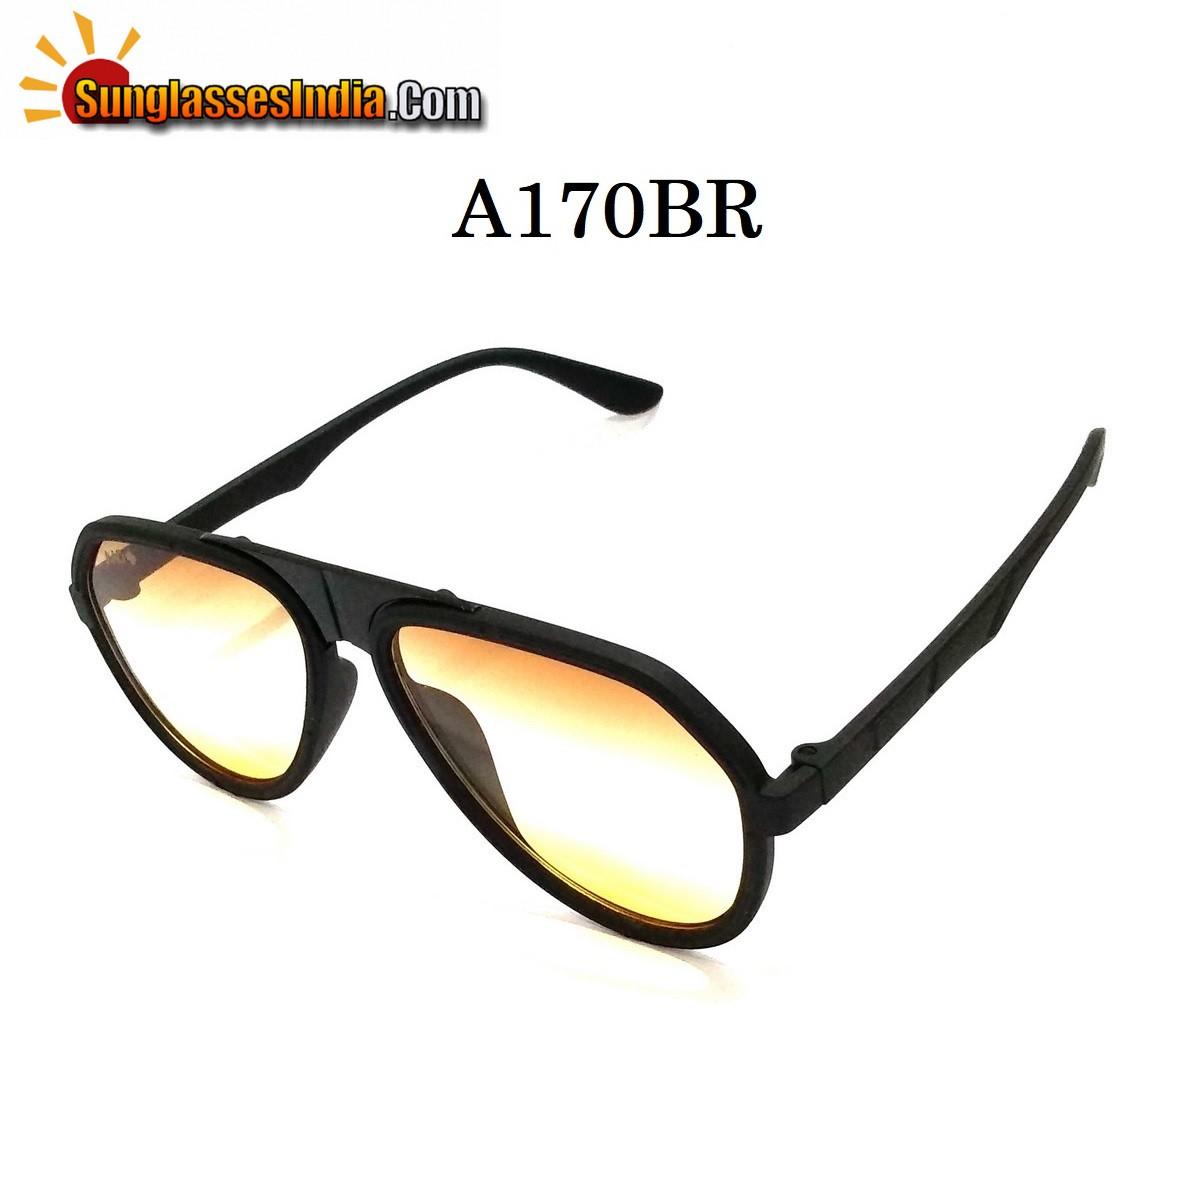 Brown Gradient Aviators Sunglasses AA170BR